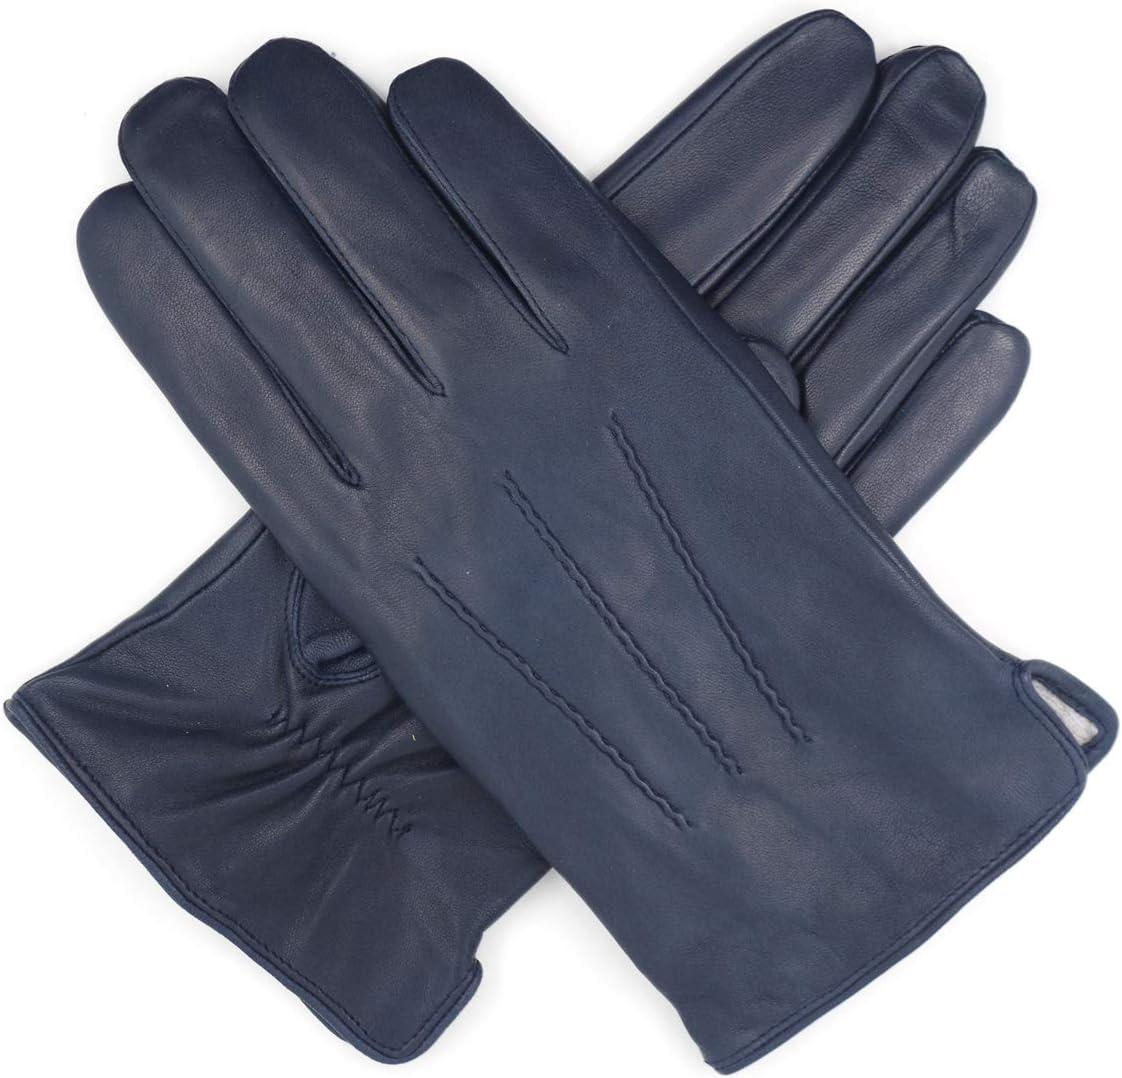 Harssidanzar Mens Luxury Italian Sheepskin Leather Gloves Vintage Finished Cashmere Lined Upgrade Brandy M